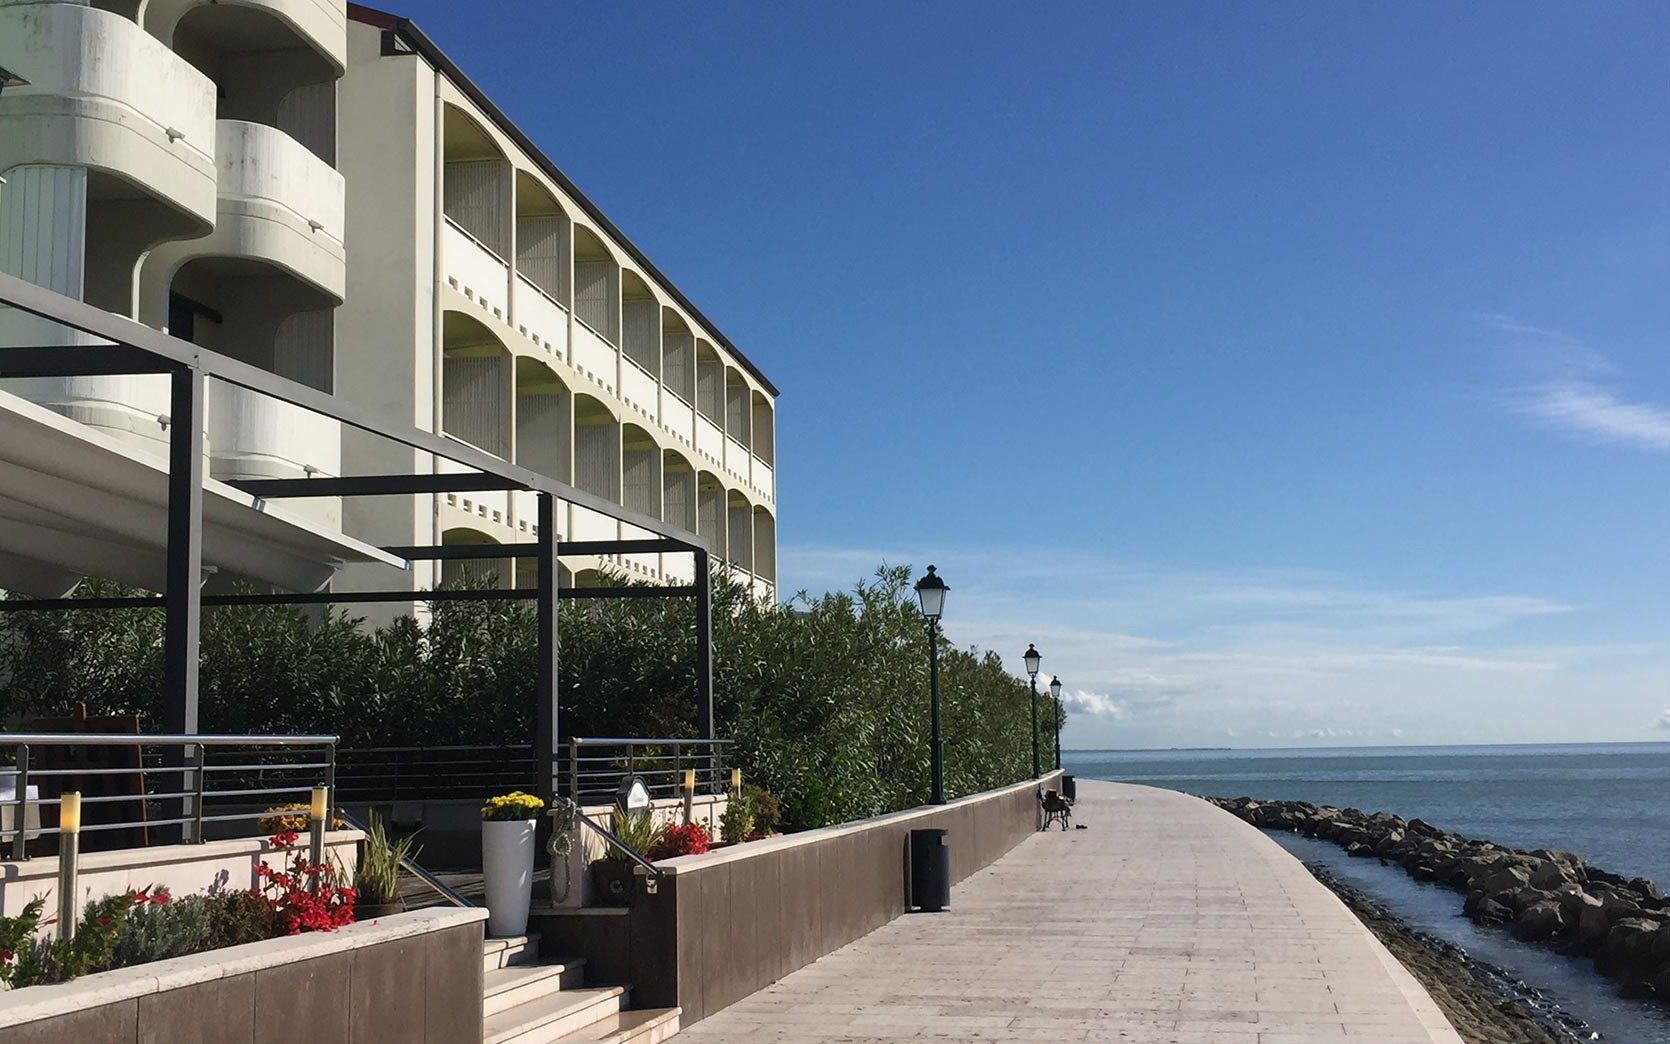 Friuli-Venezia Giulia - Grado